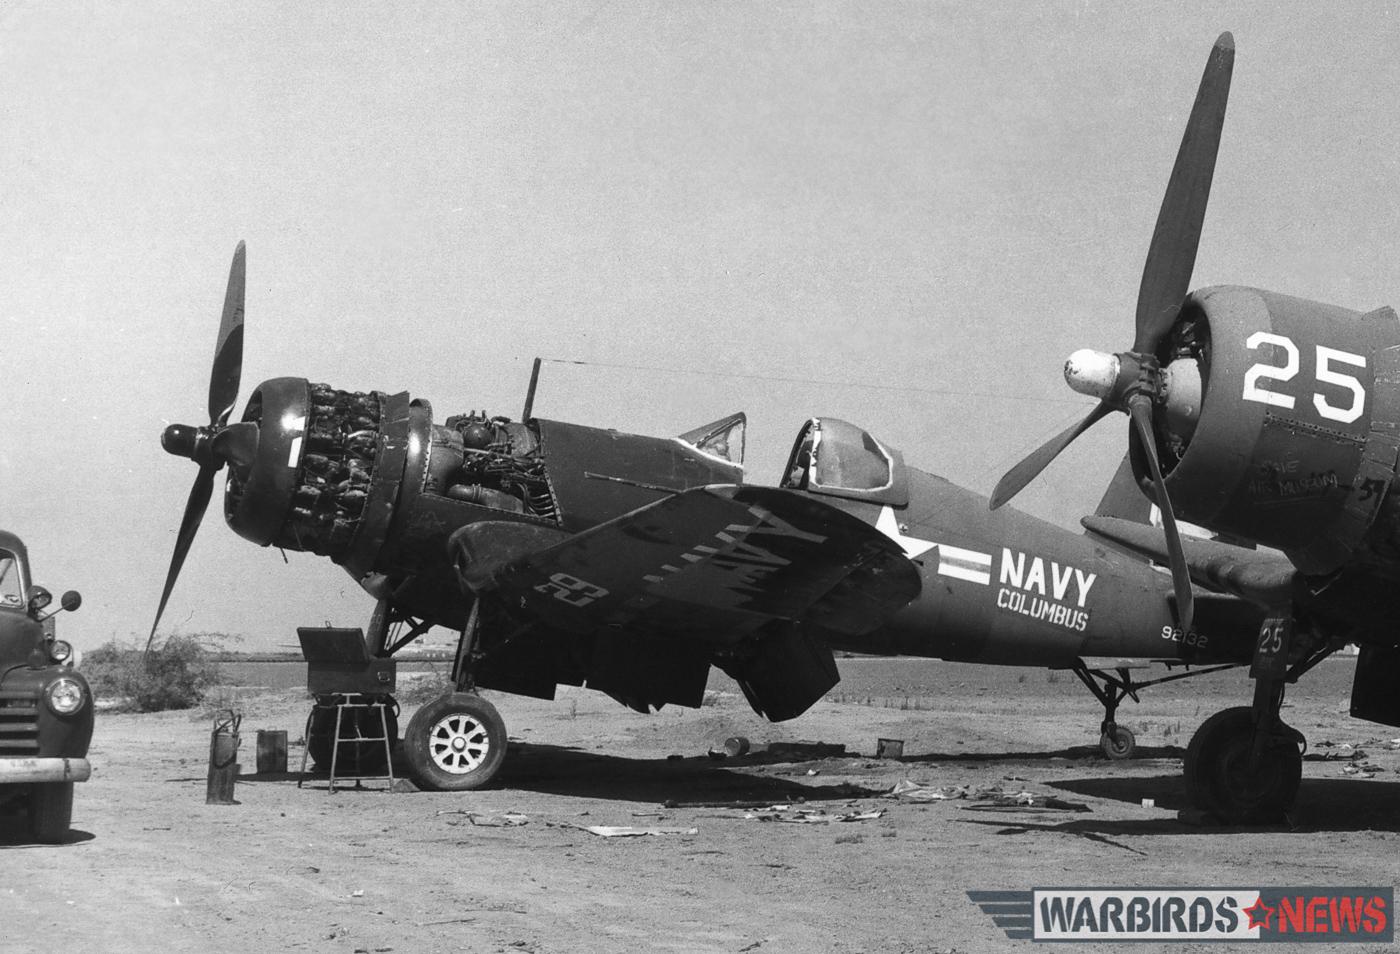 FG-1D Bu.92132 at NAF Litchfield Park in 1958. (Ed Maloney via Jim Sullivan)